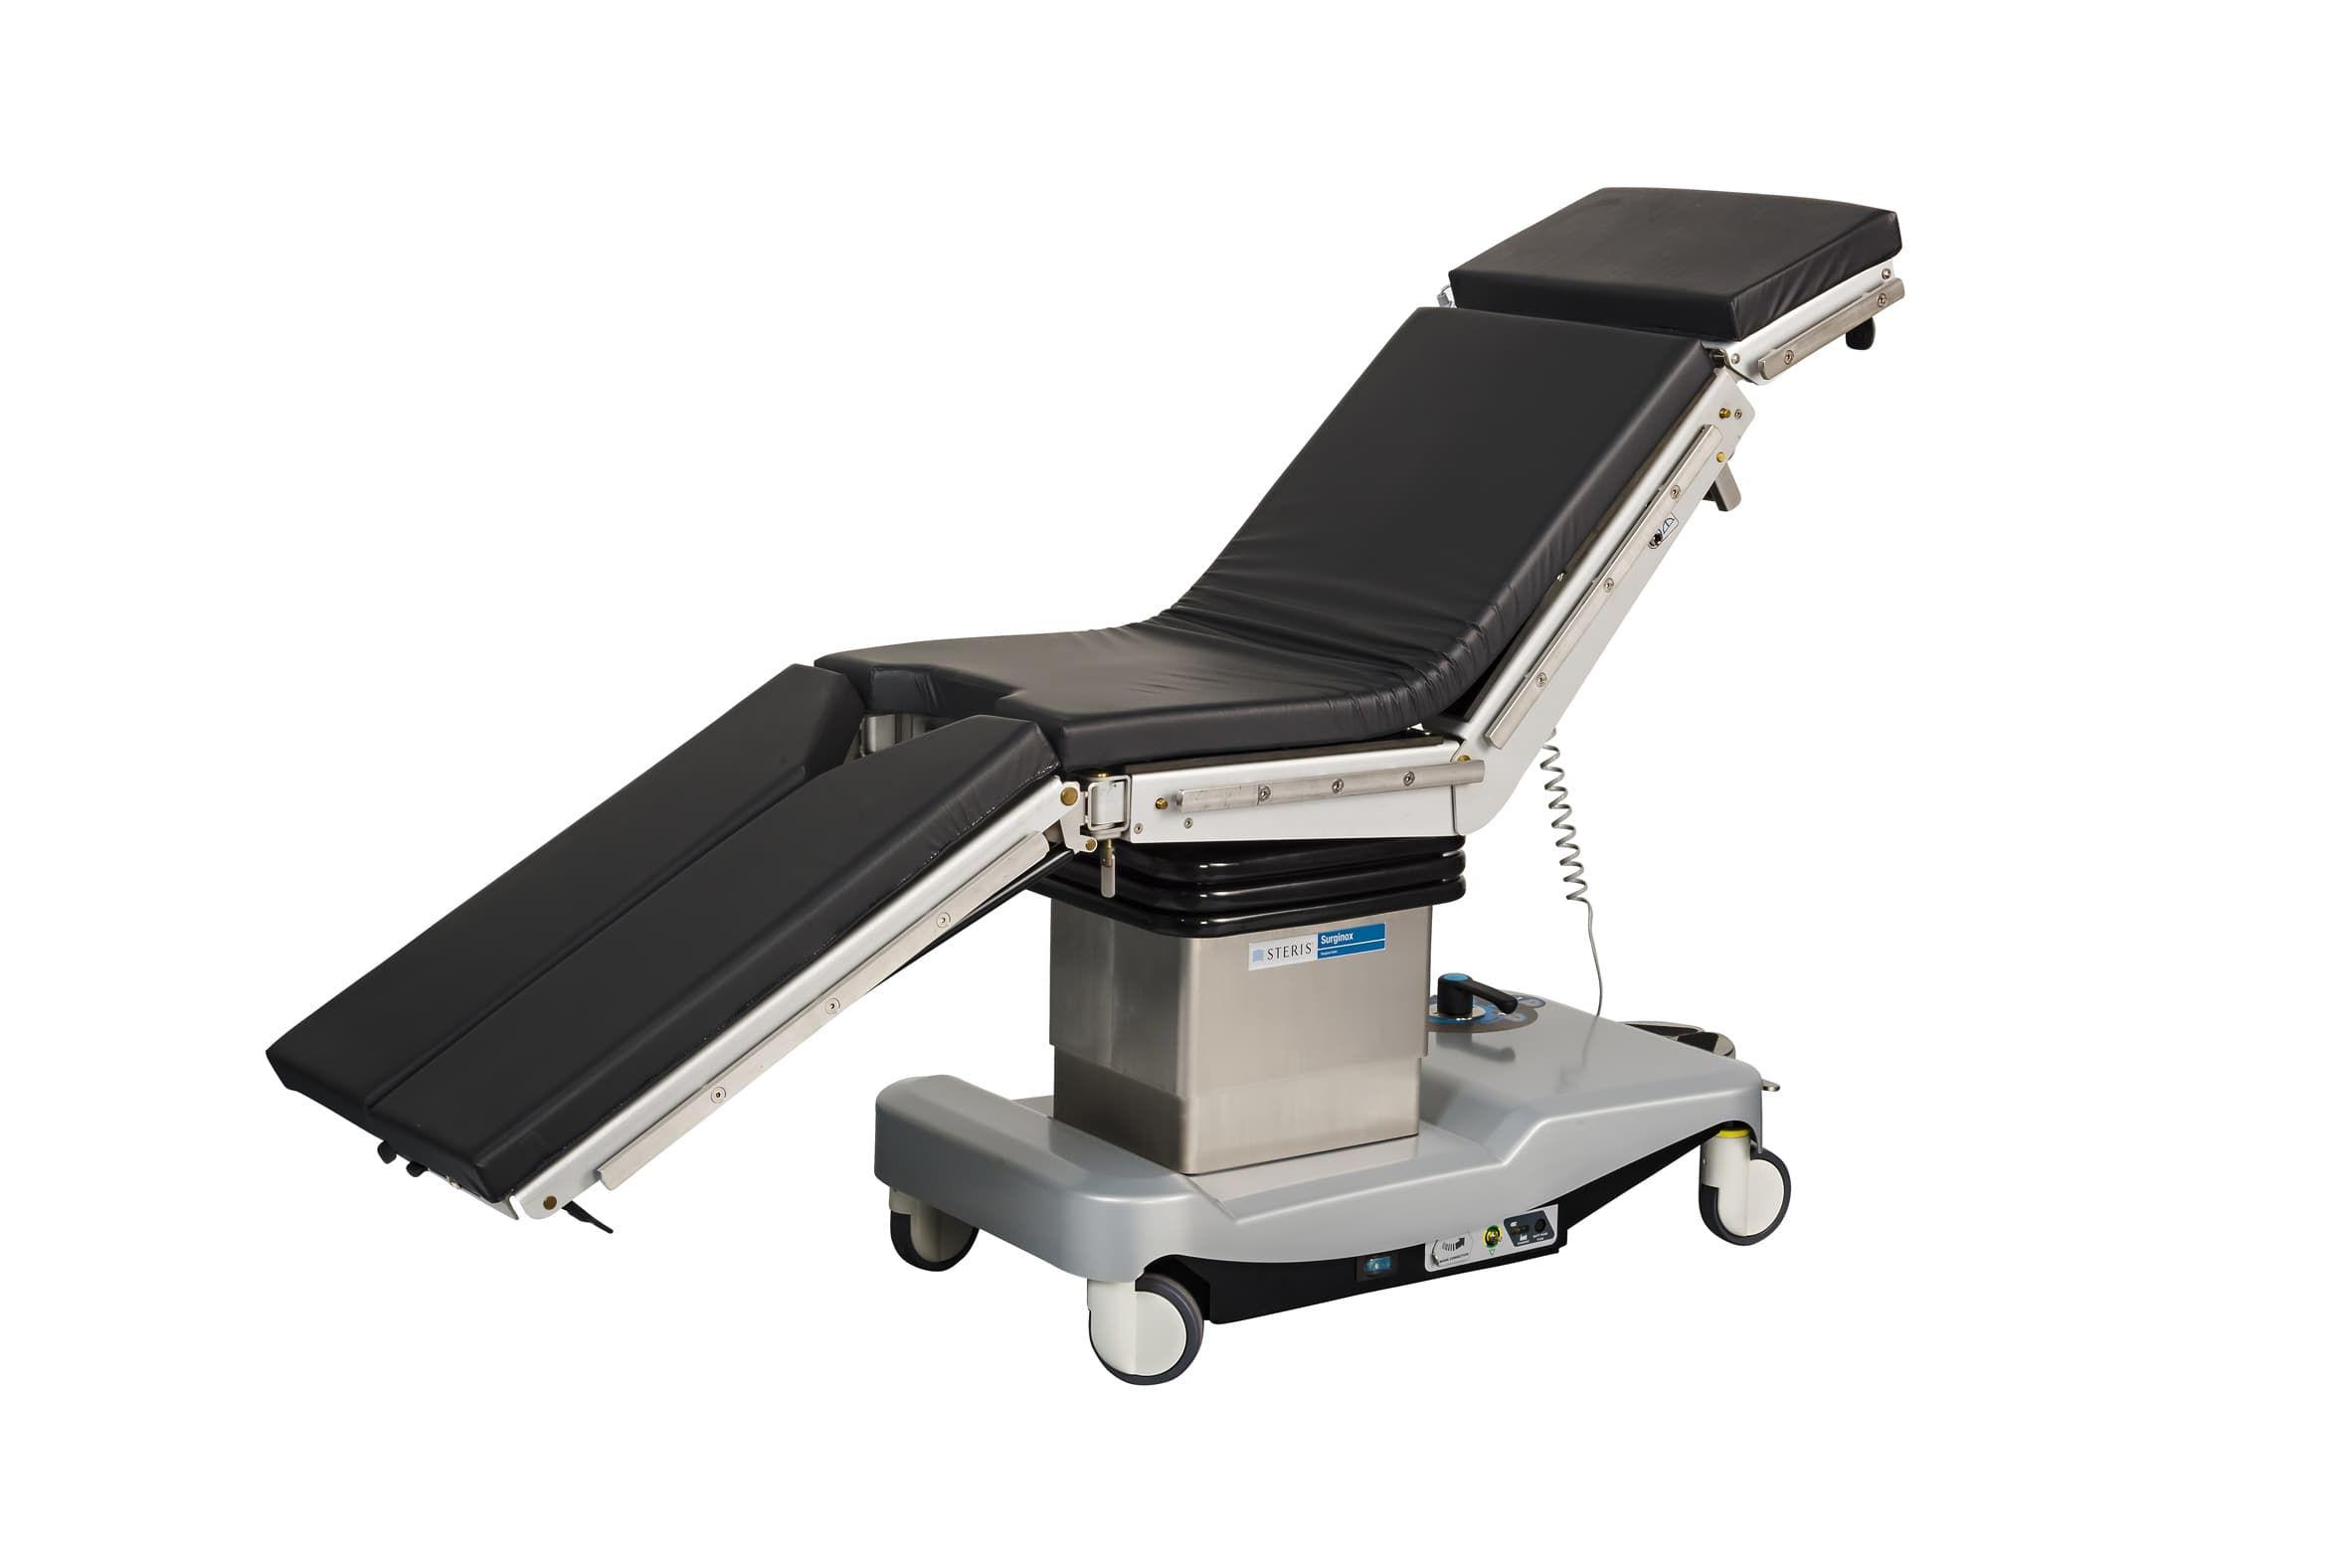 Операционный стол Steris Surginox